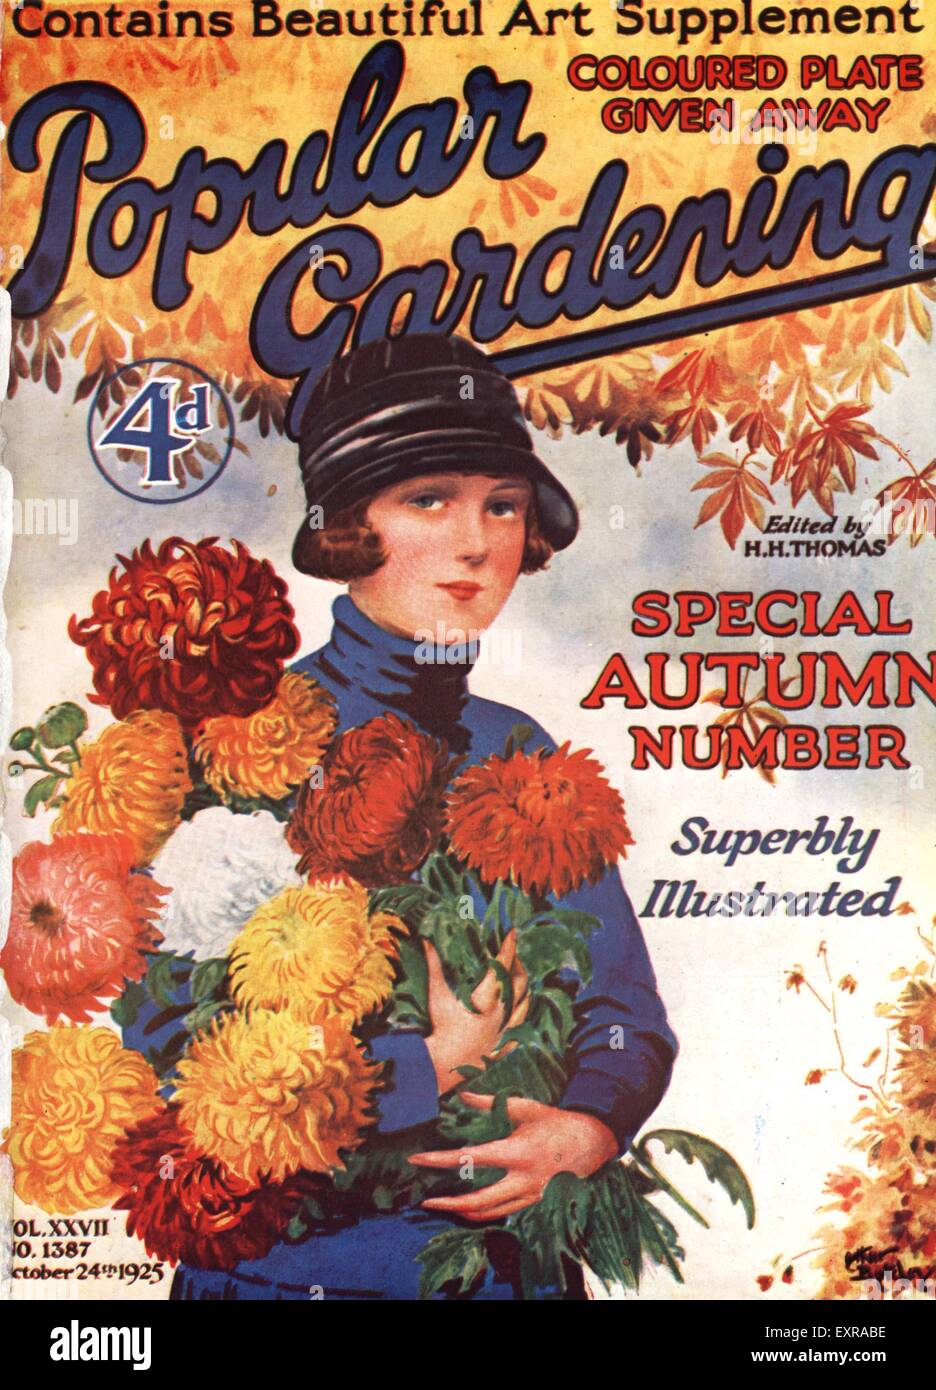 1920s Uk Popular Gardening Magazine Cover Stock Photo 85335586